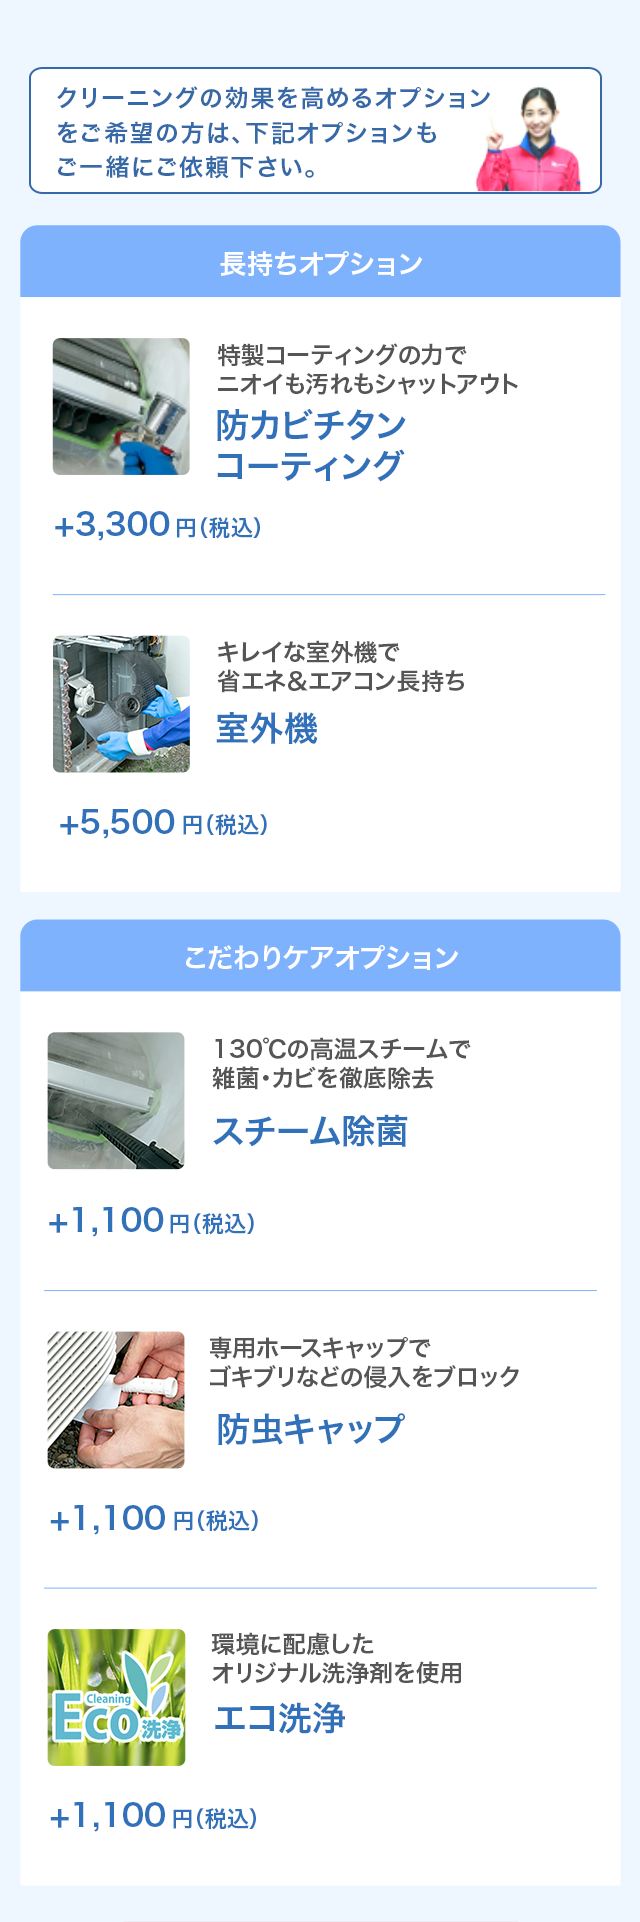 sp_2105aircon_16